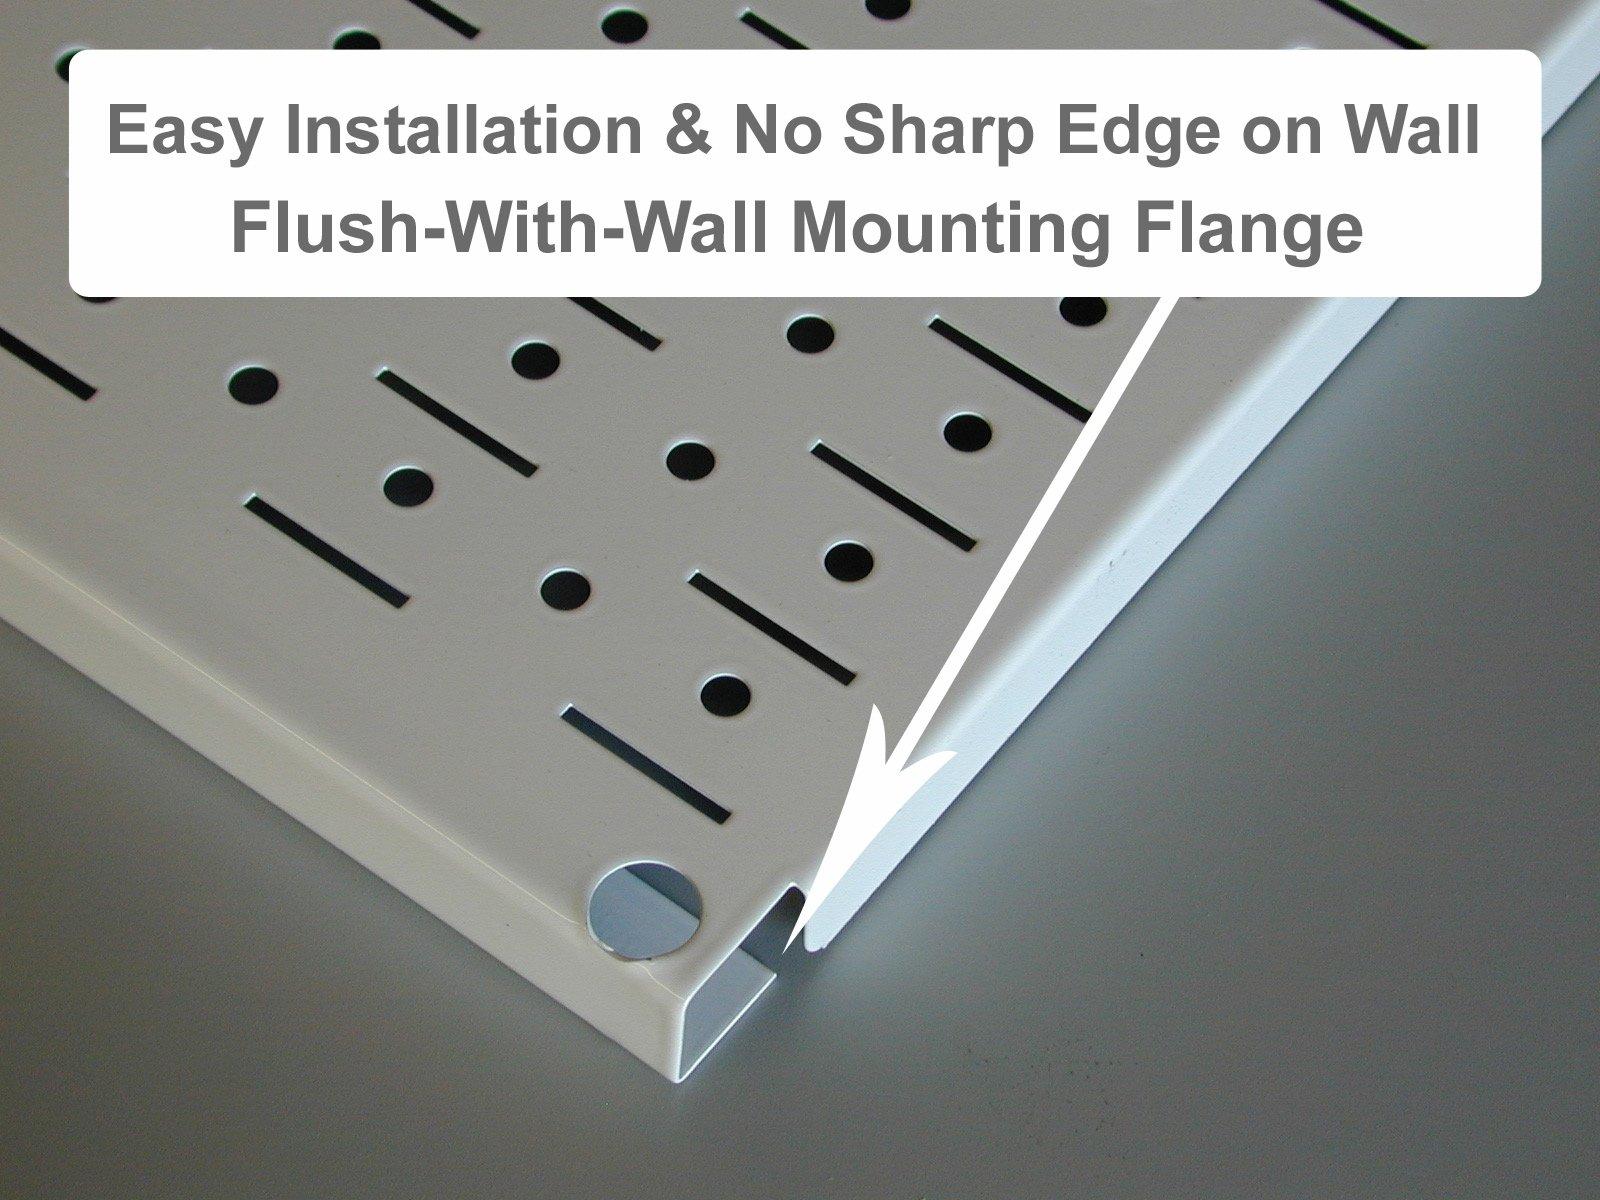 Wall Control 30-WRK-800WB Master Workbench Metal Pegboard Tool Organizer by Wall Control (Image #7)